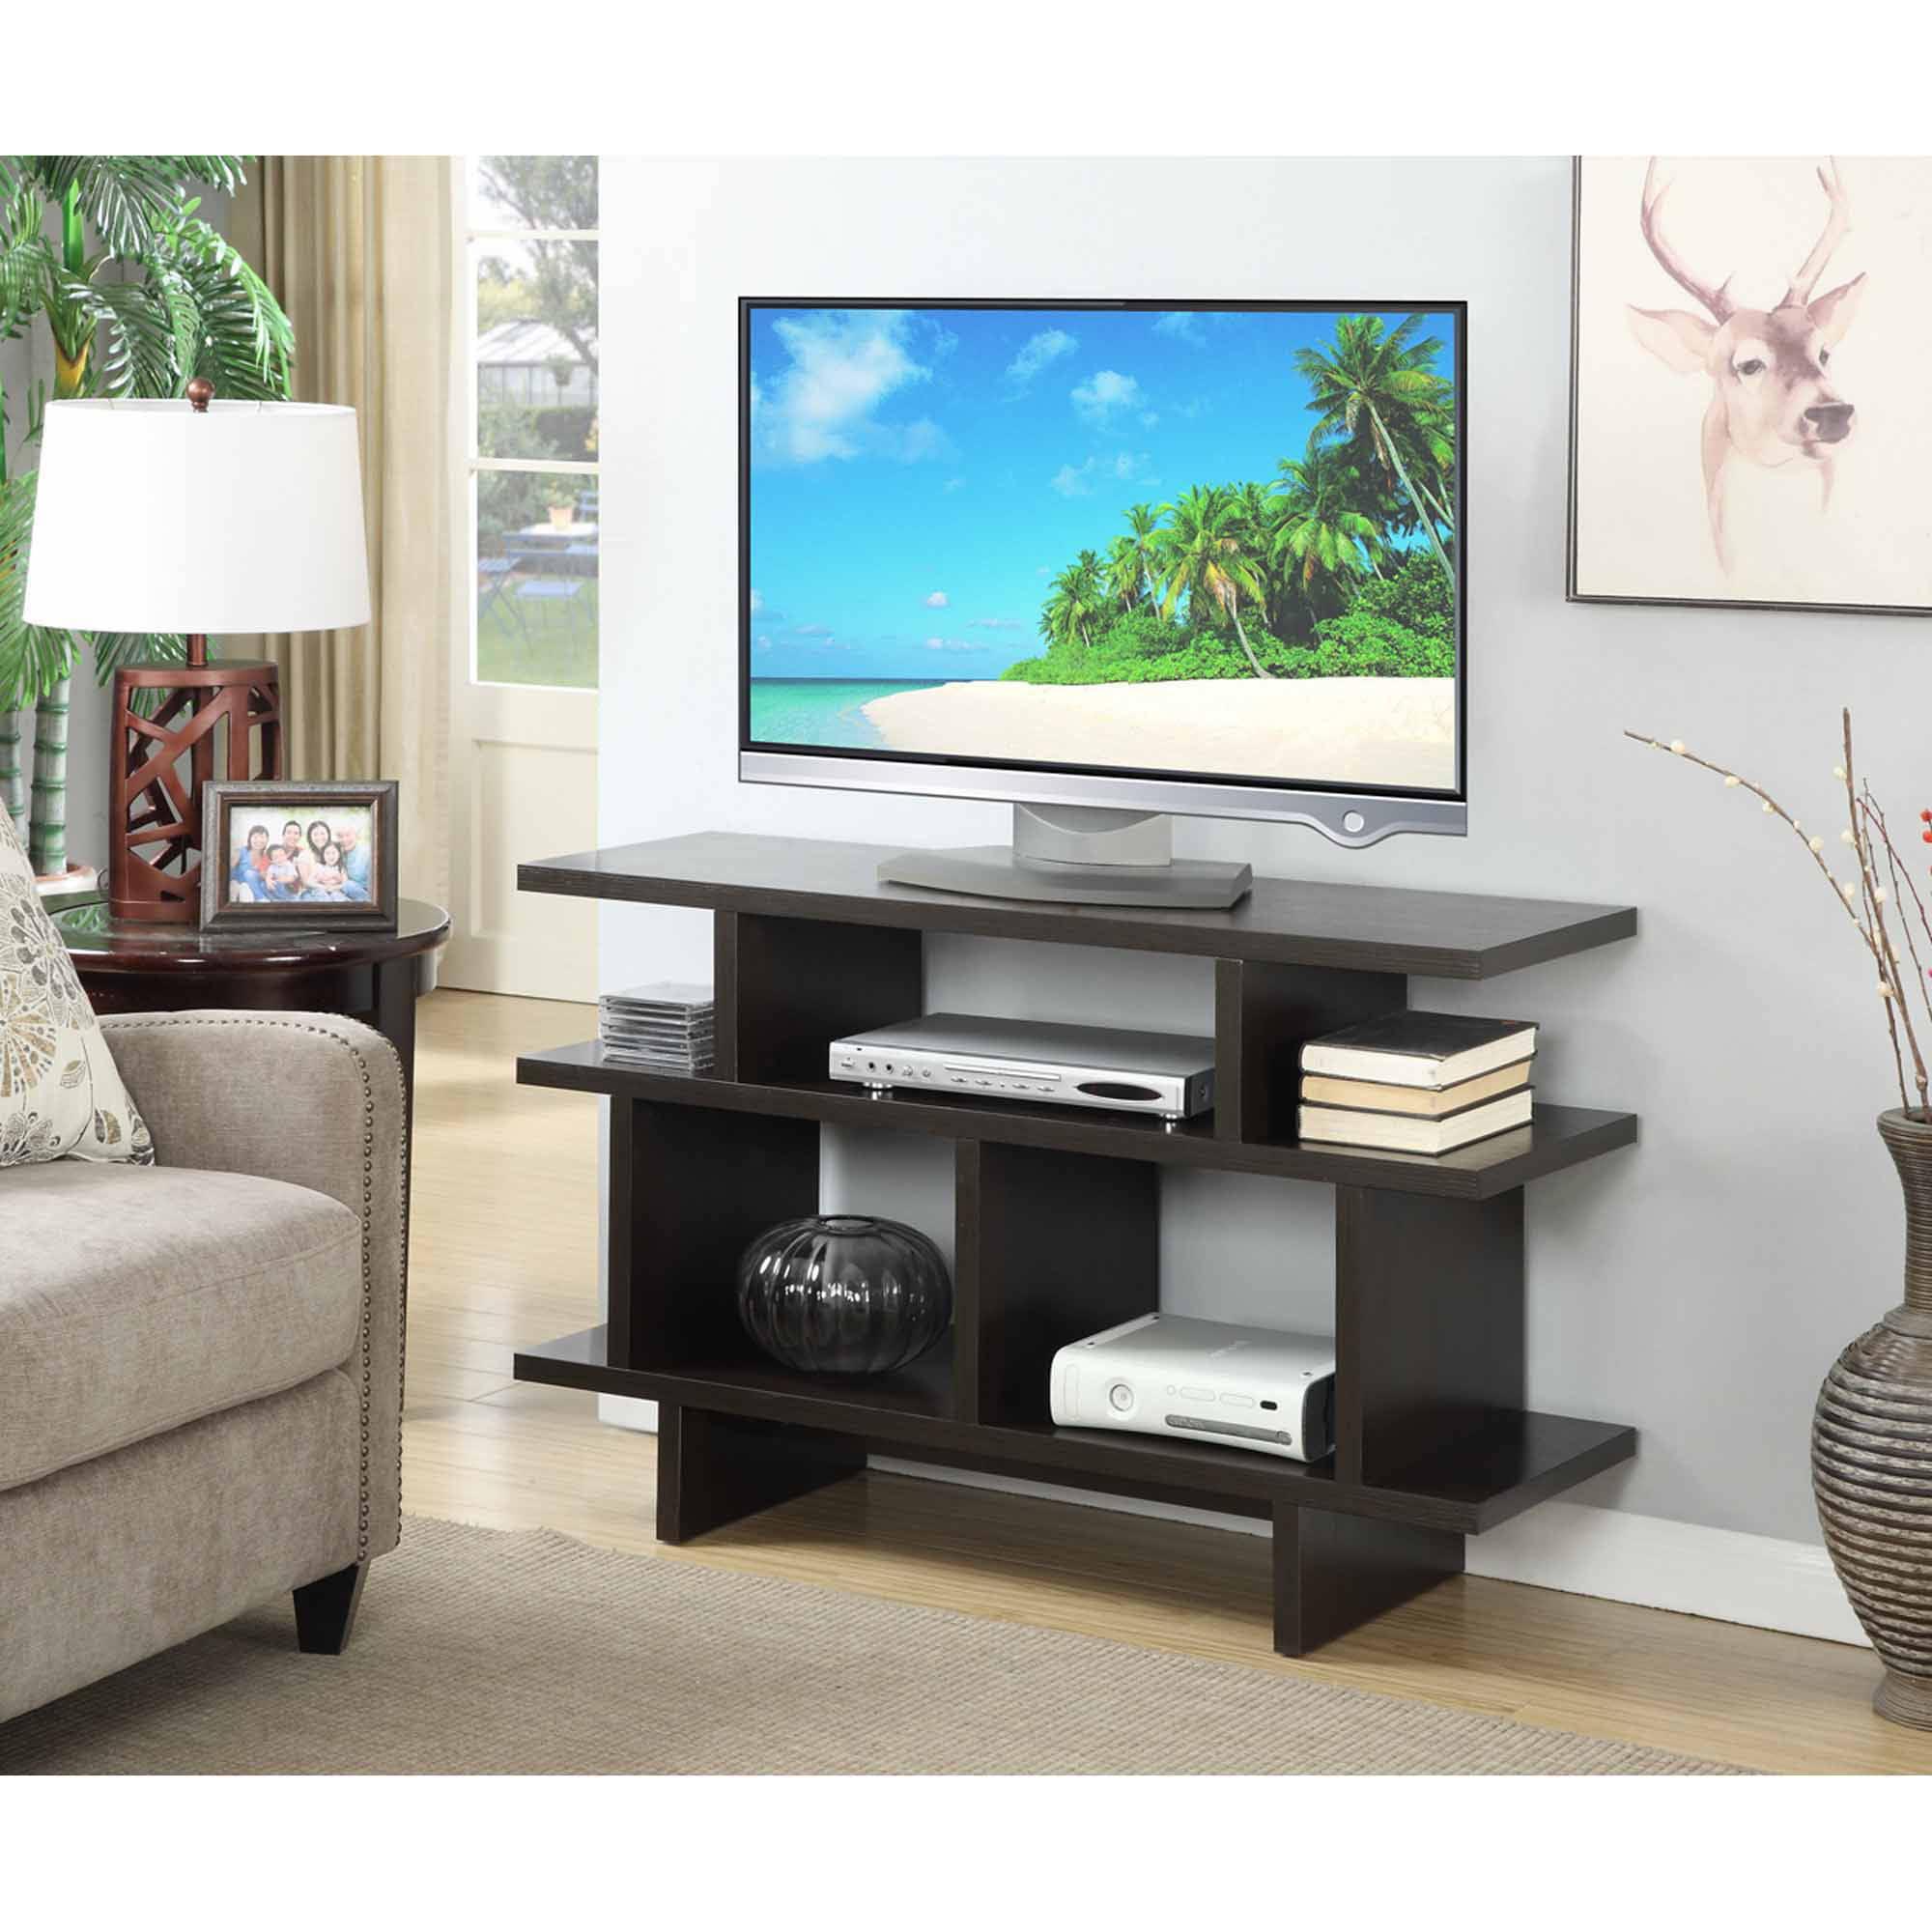 "Convenience Concepts Key West 48"" TV Stand Console, Multiple Colors"